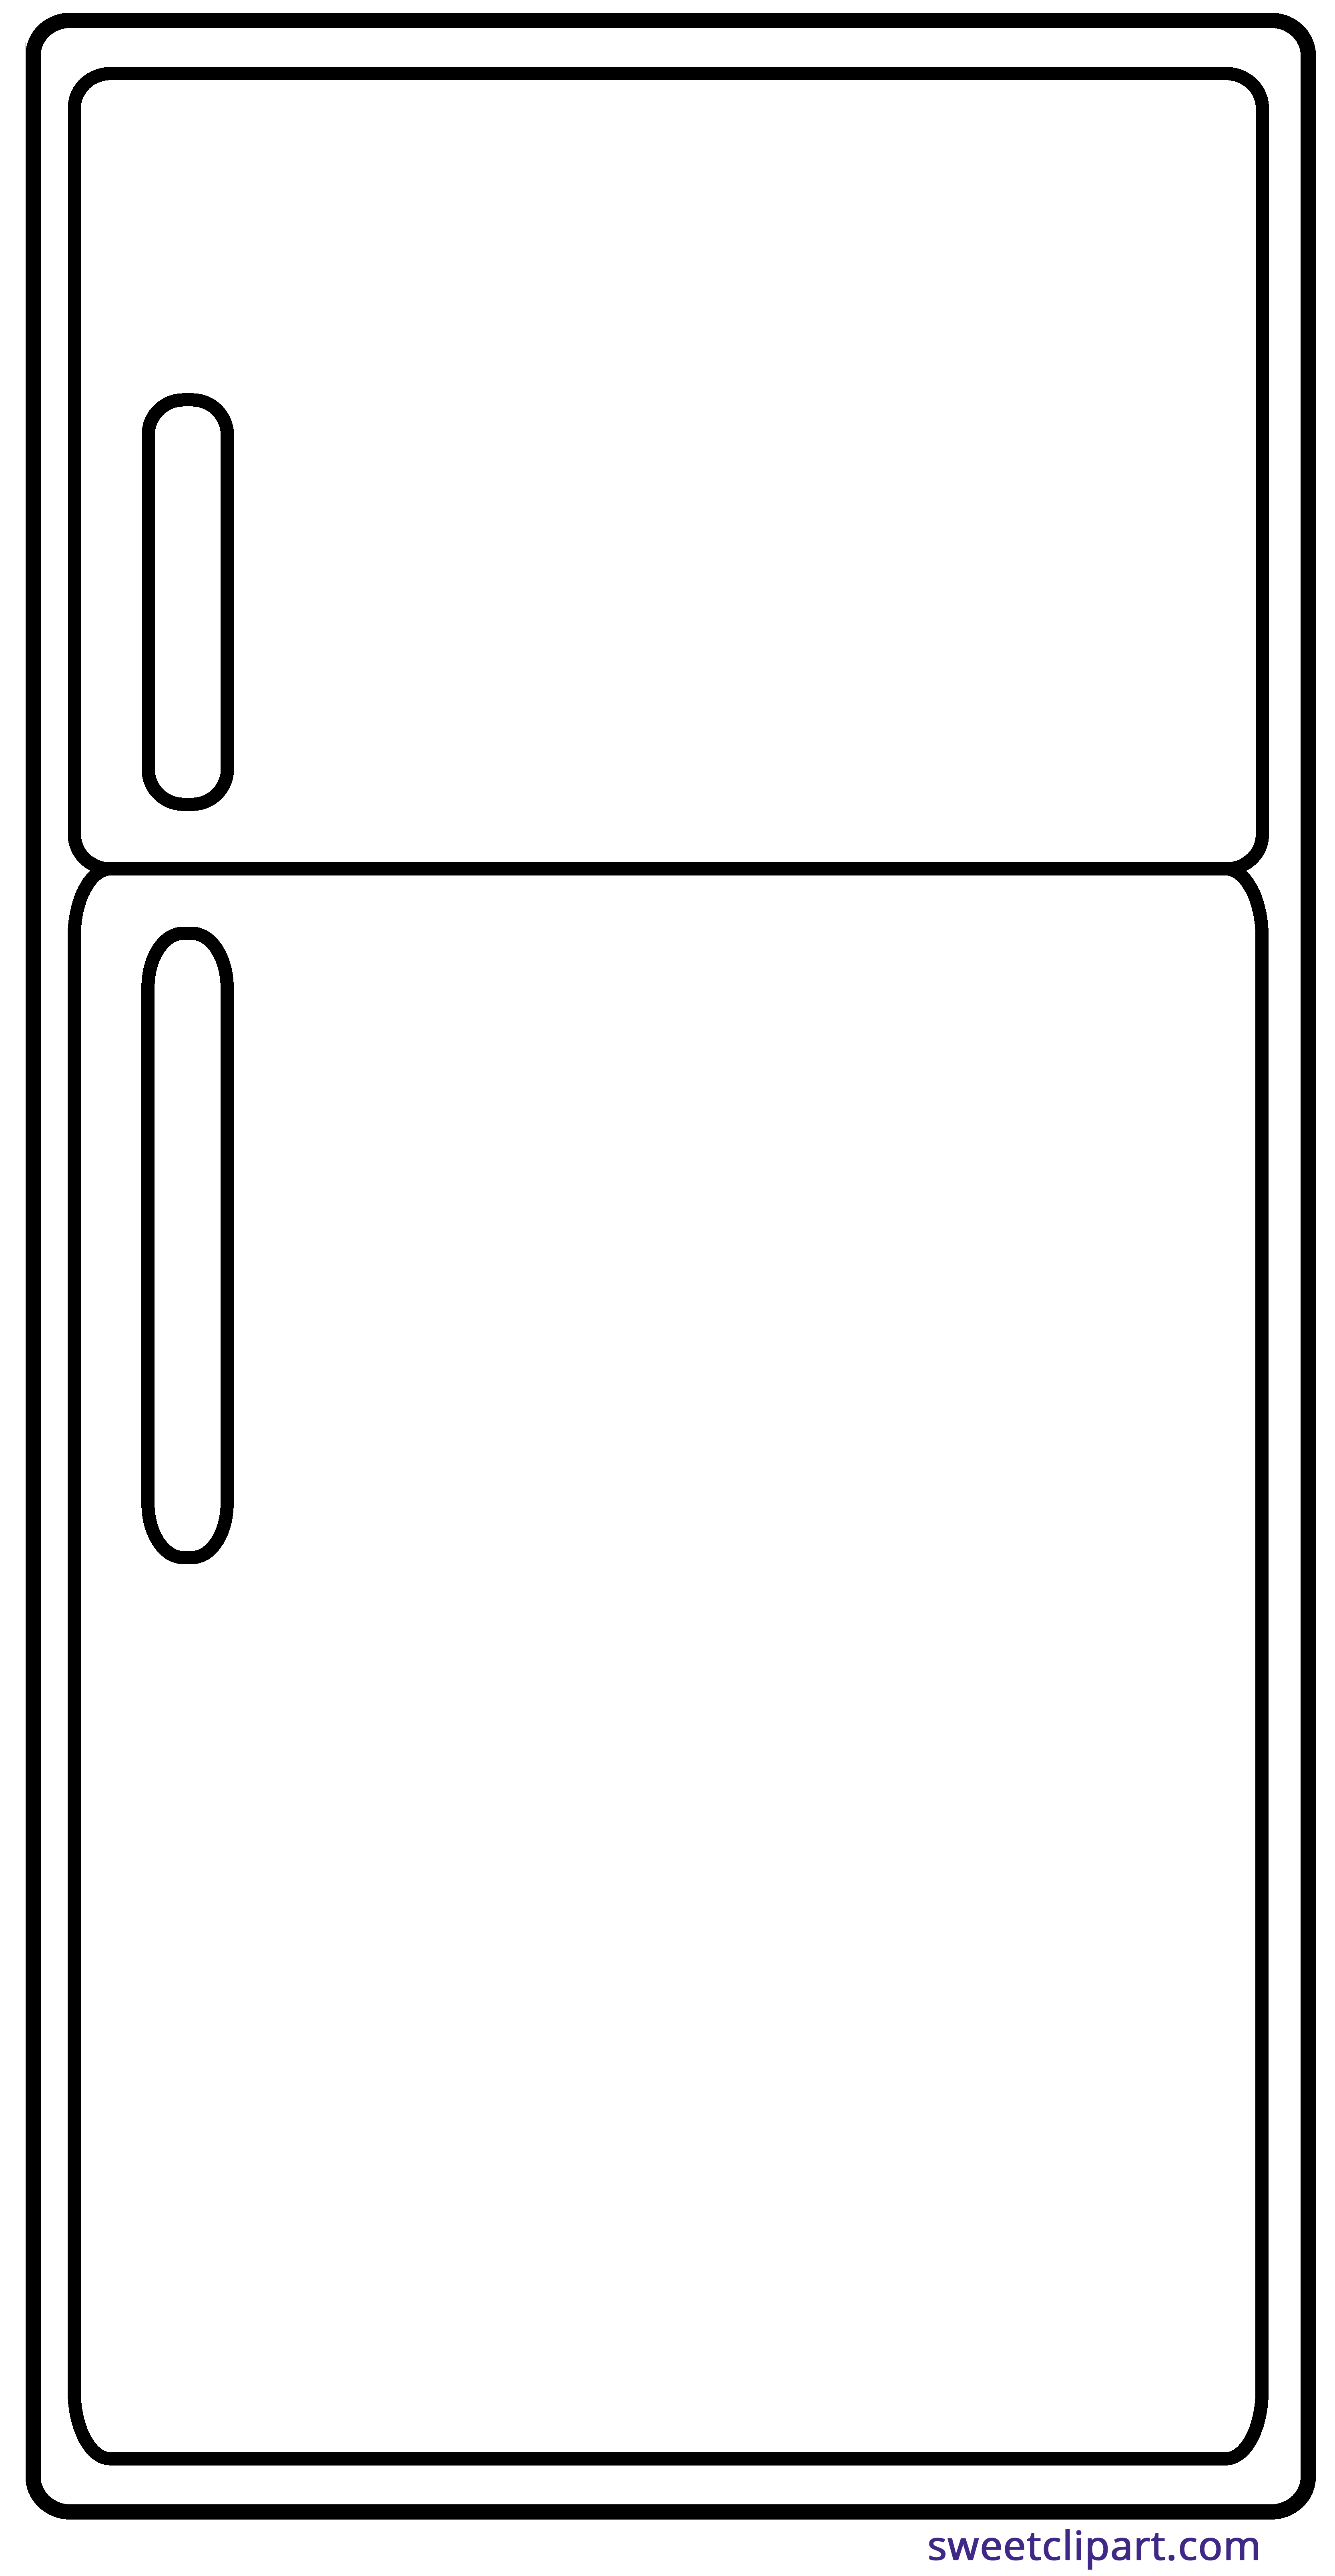 Refrigerator clipart. Outline sweet clip art